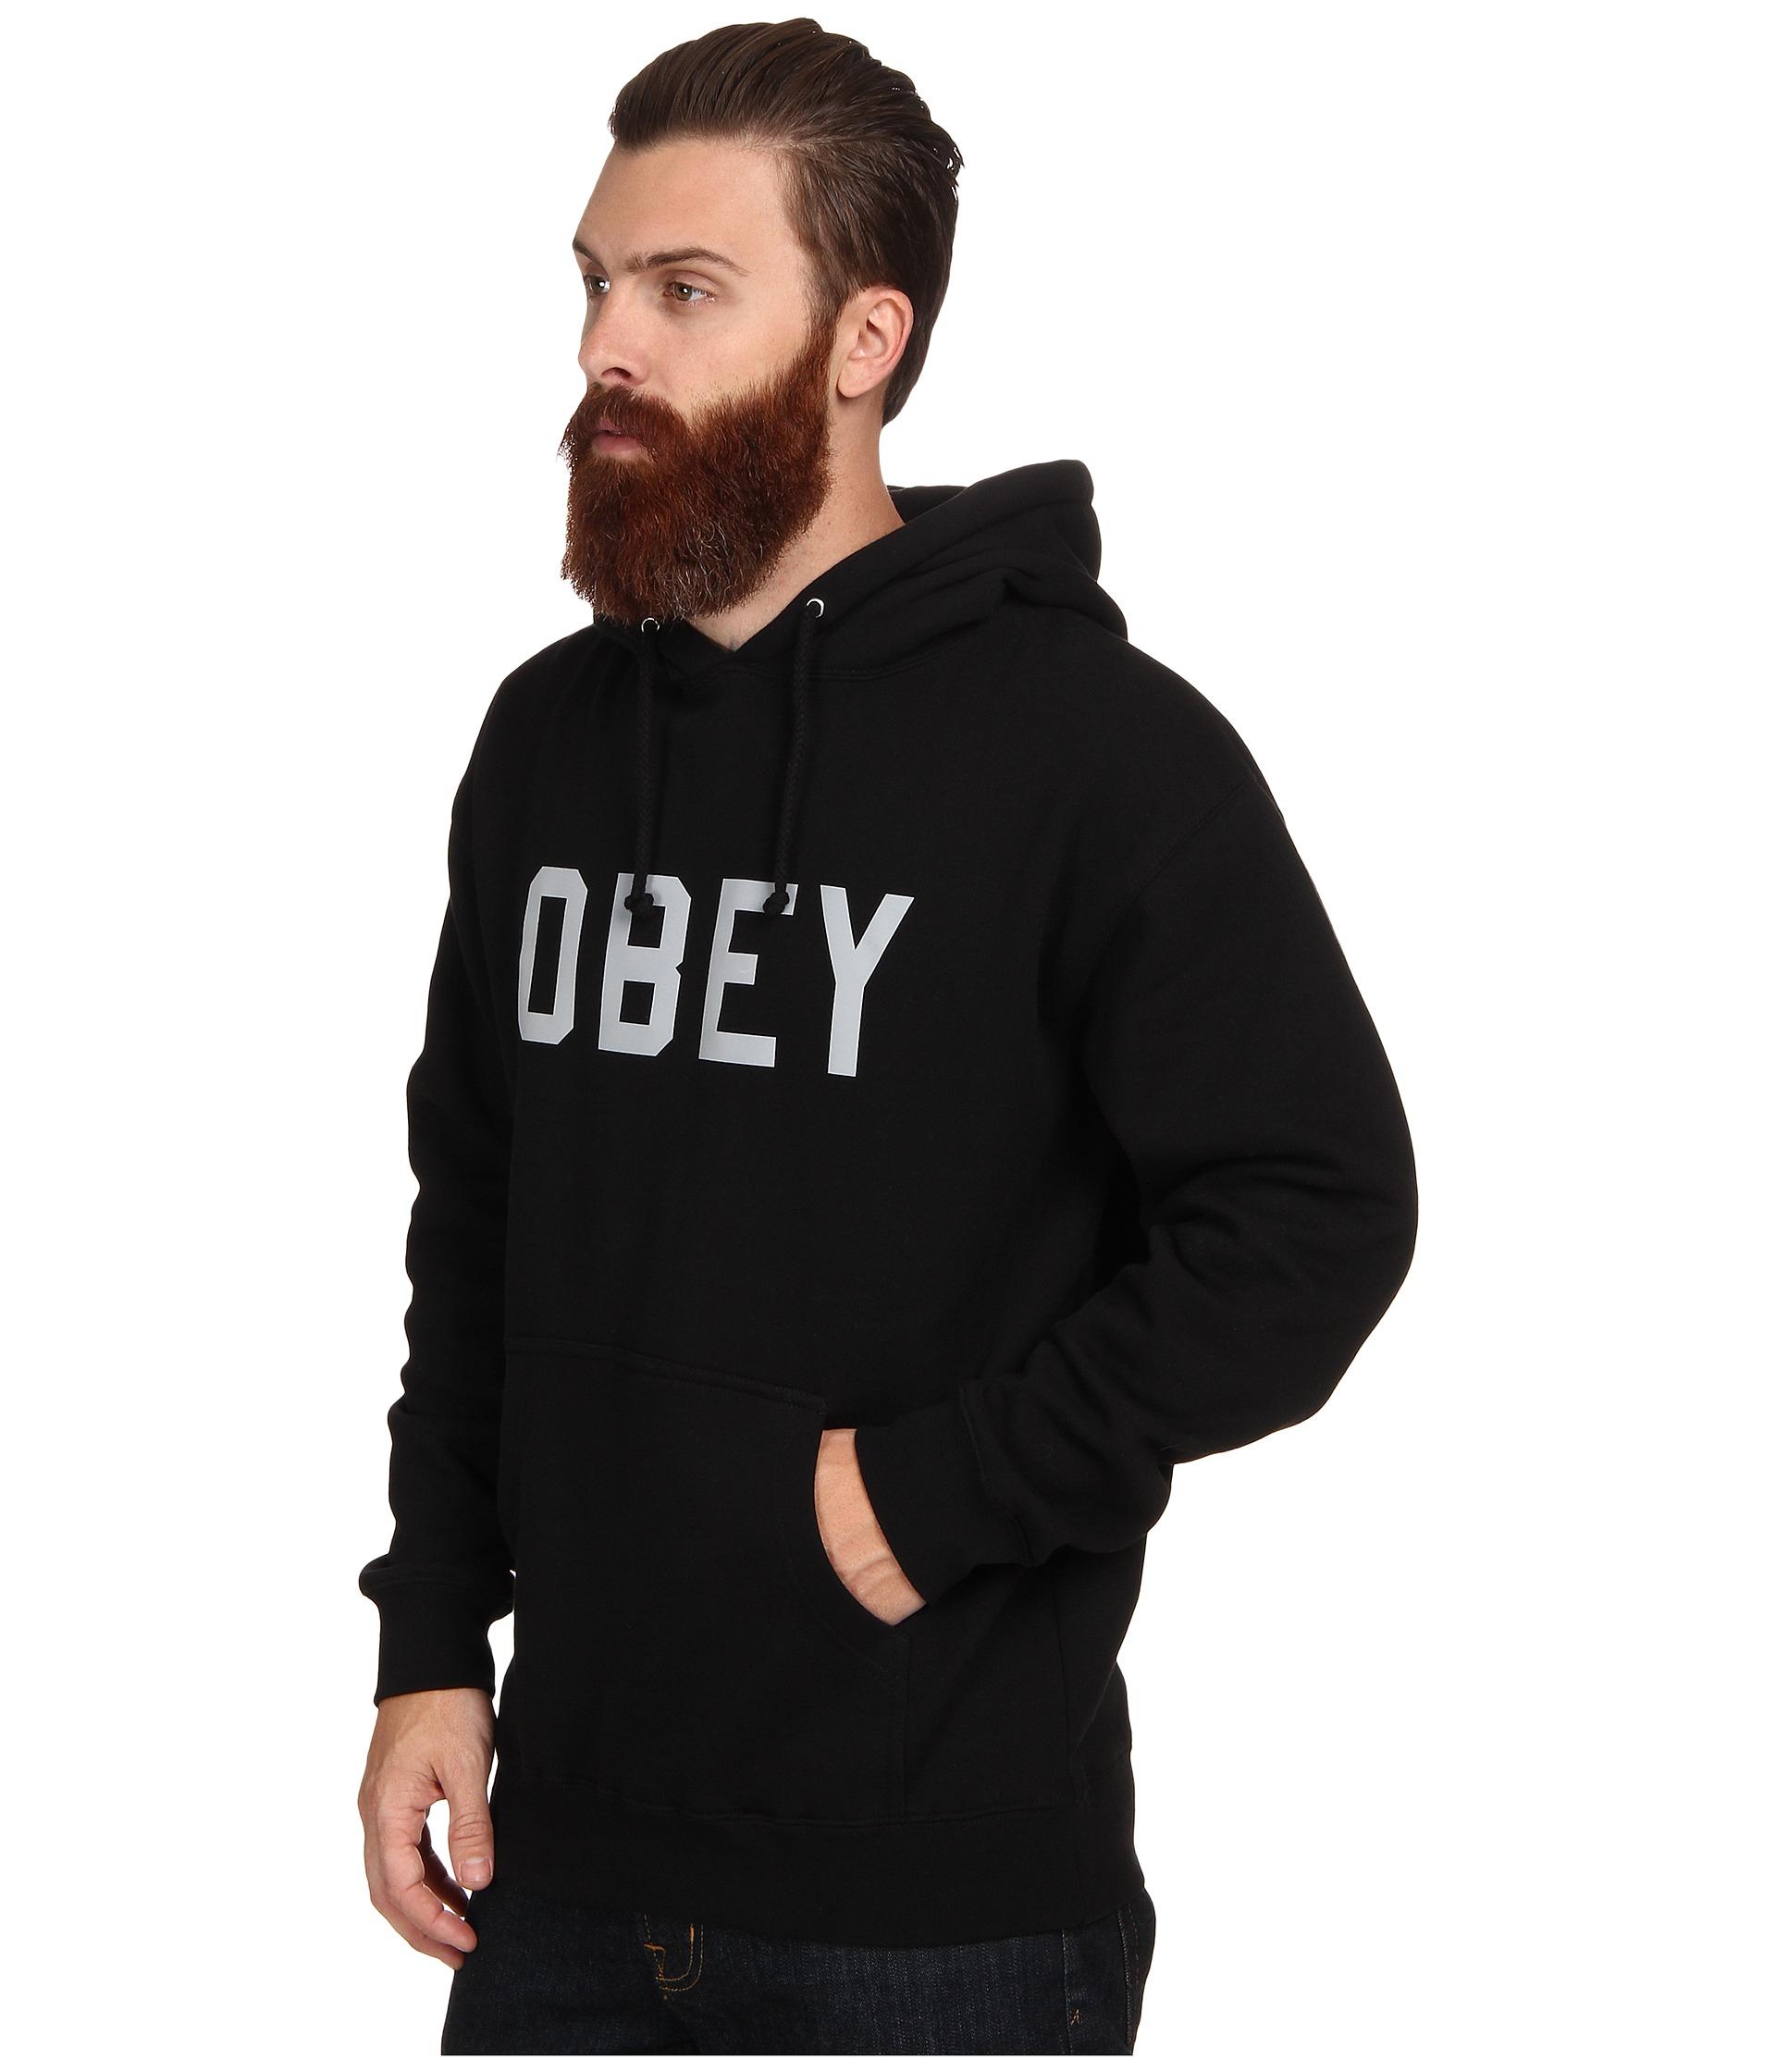 obey collegiate 3m reflective pullover hood sweatshirt in black for men lyst. Black Bedroom Furniture Sets. Home Design Ideas